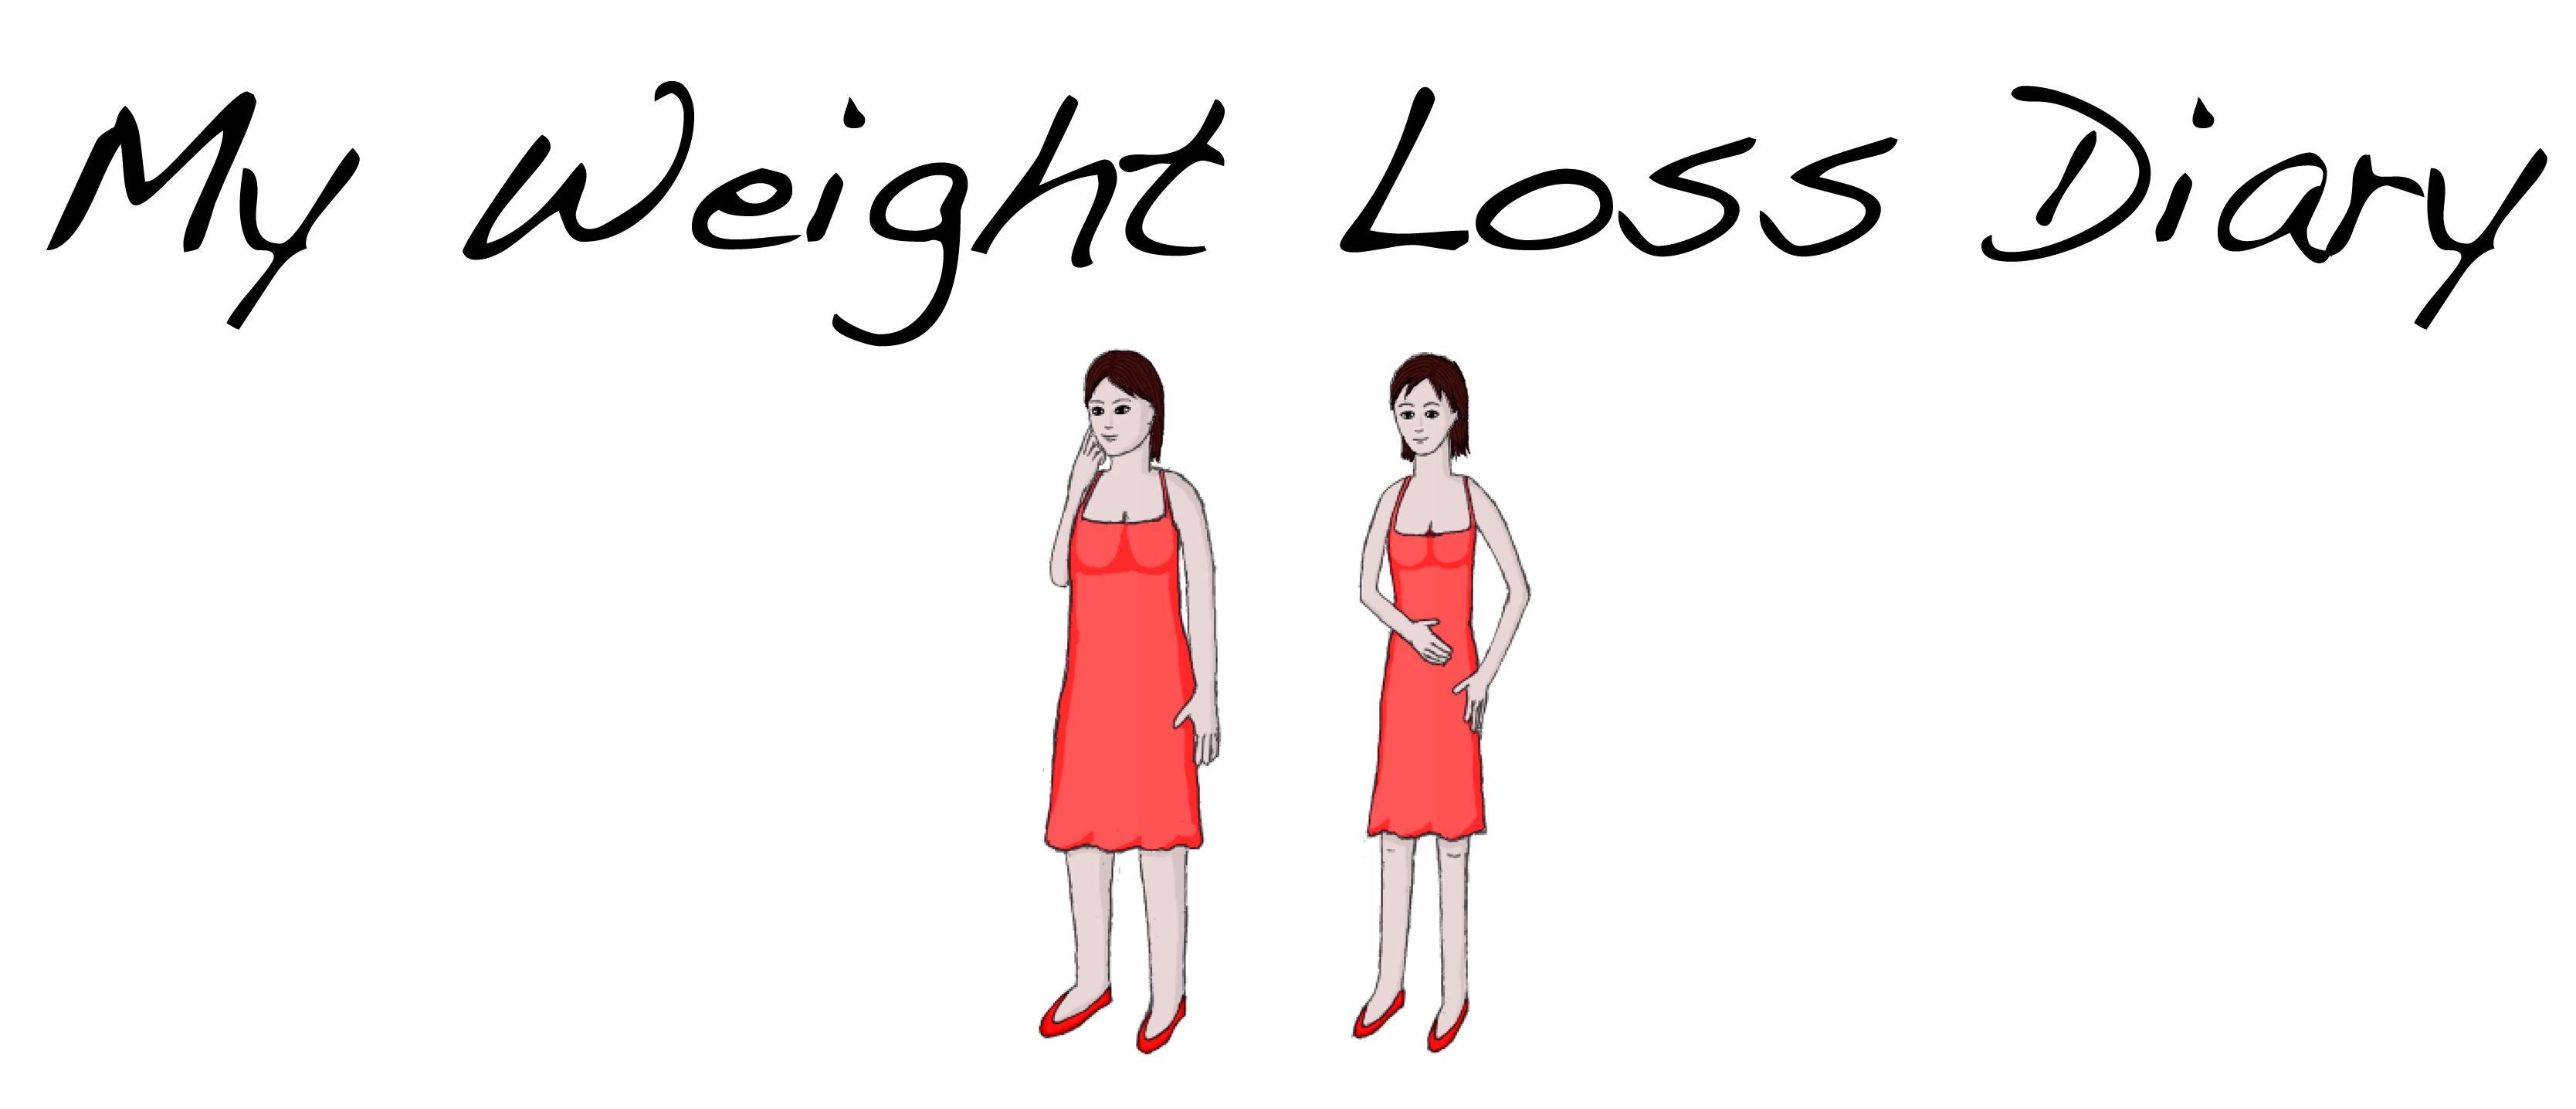 Ashley graham weight loss diet